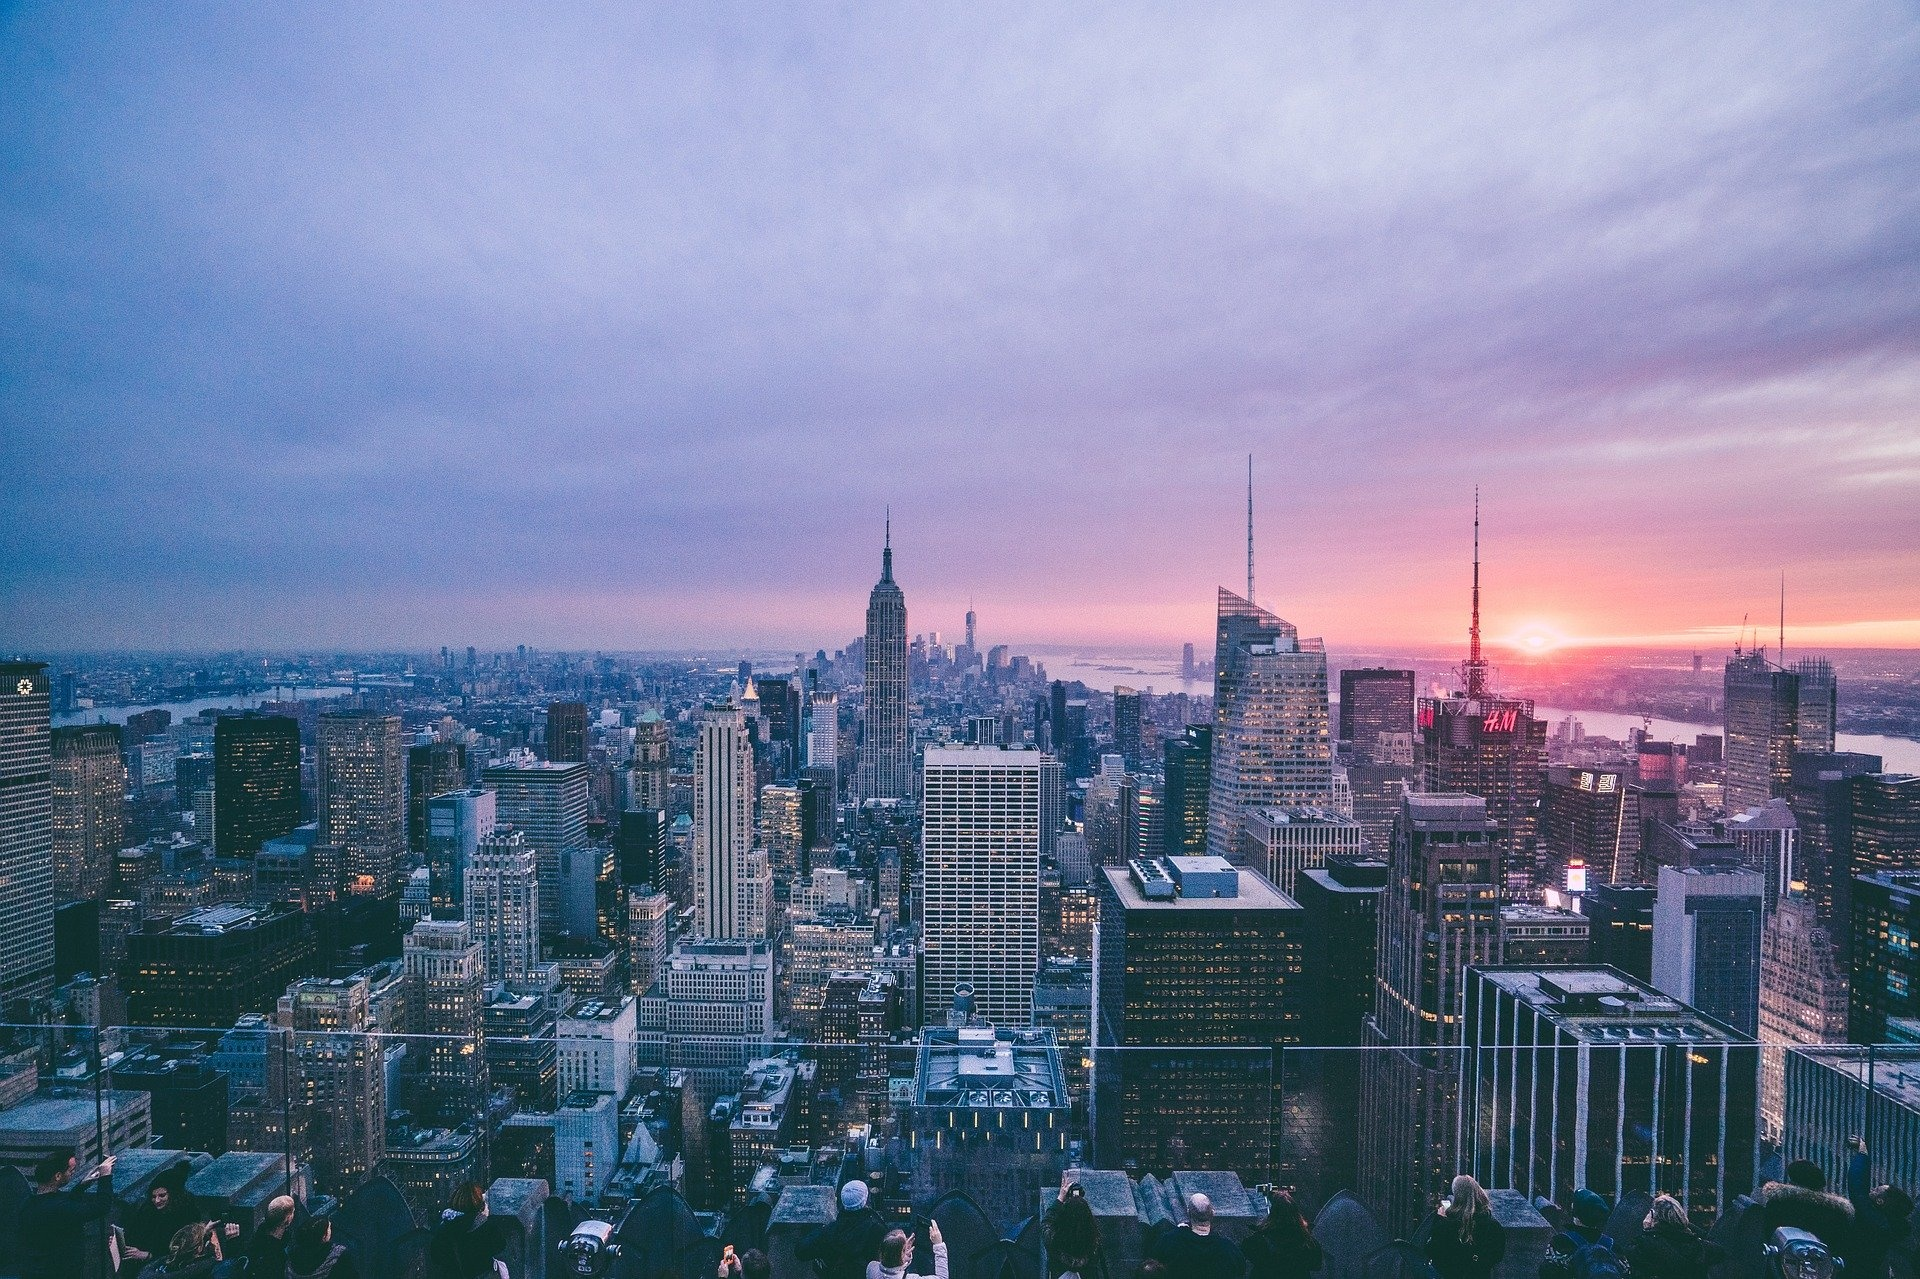 New York City, NYC, YSG Solar